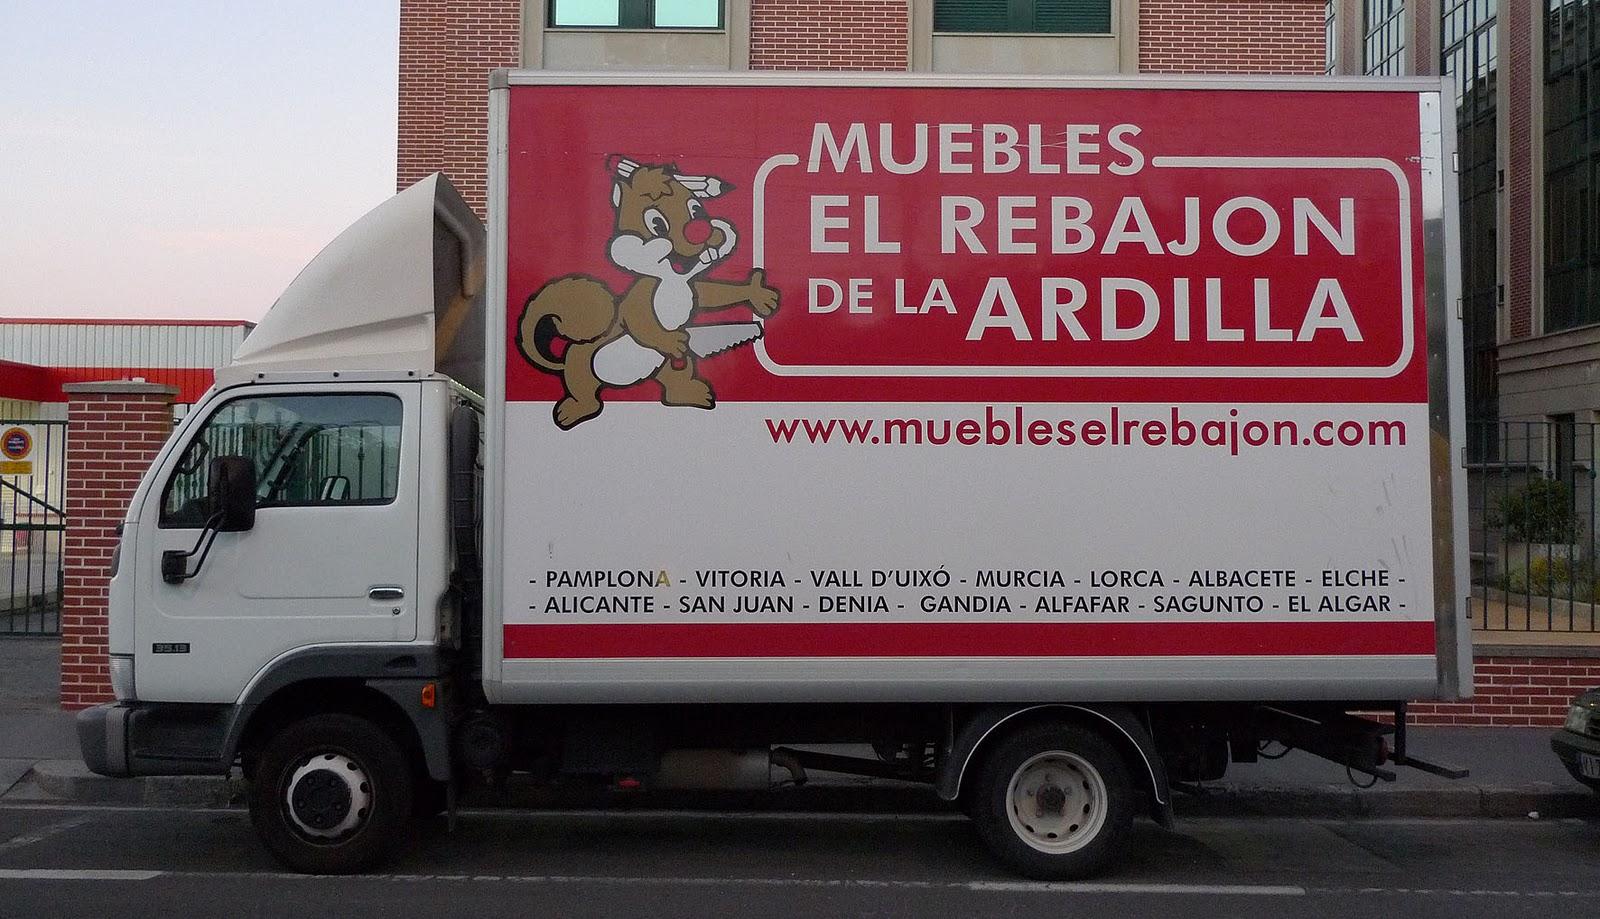 Dogothink naming curiosity 001 for Muebles el rebajon